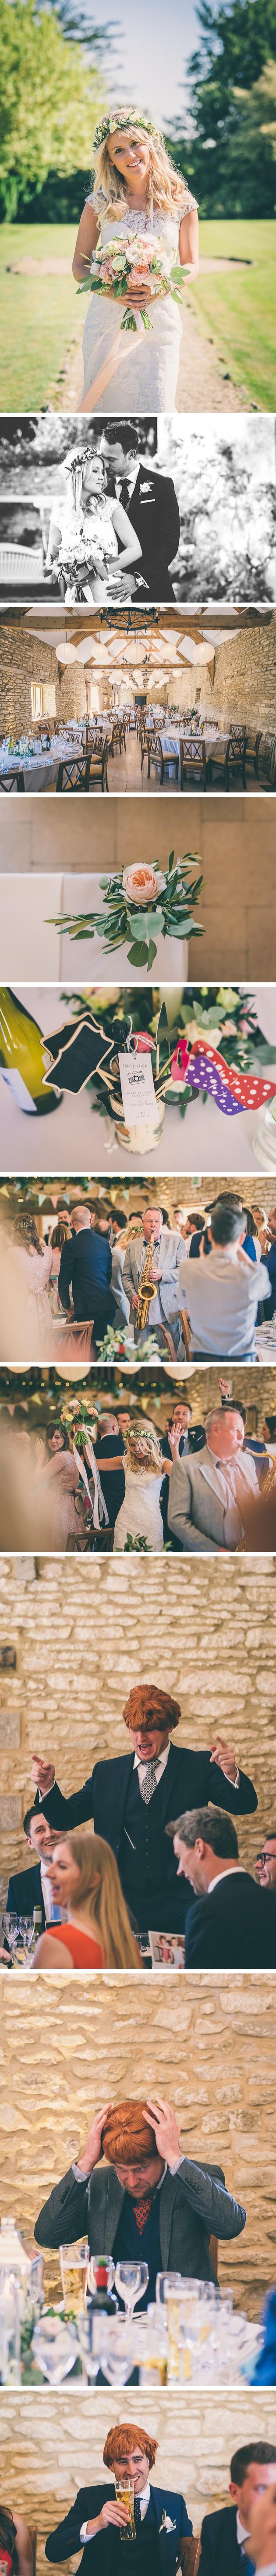 Caswell House Wedding Venue